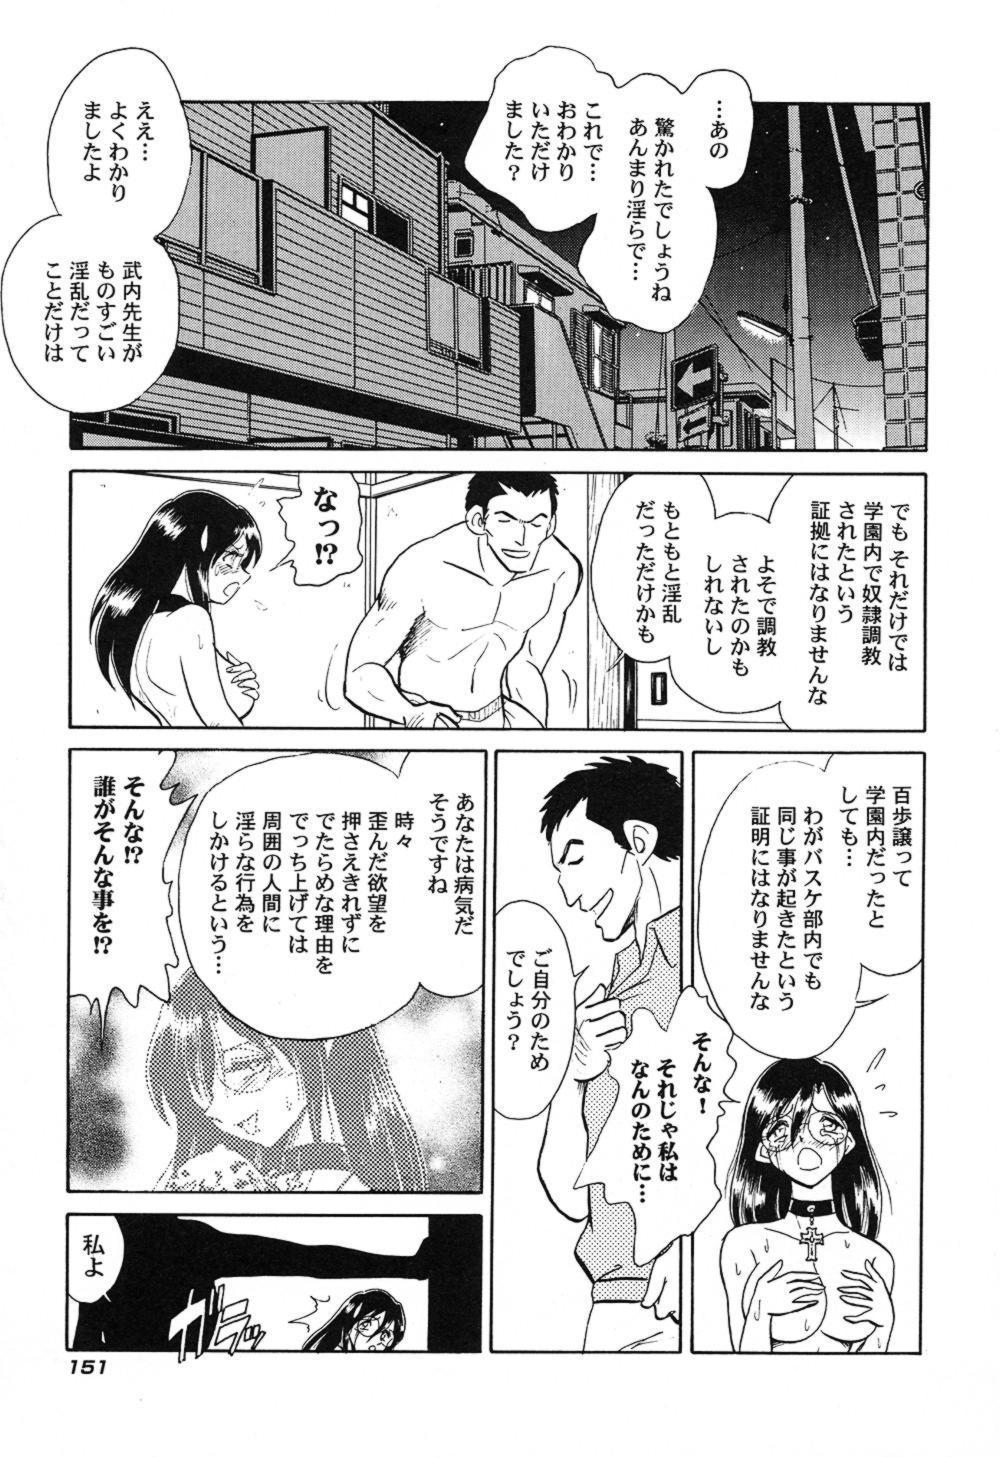 Hageshii Kagai Jugyou 153